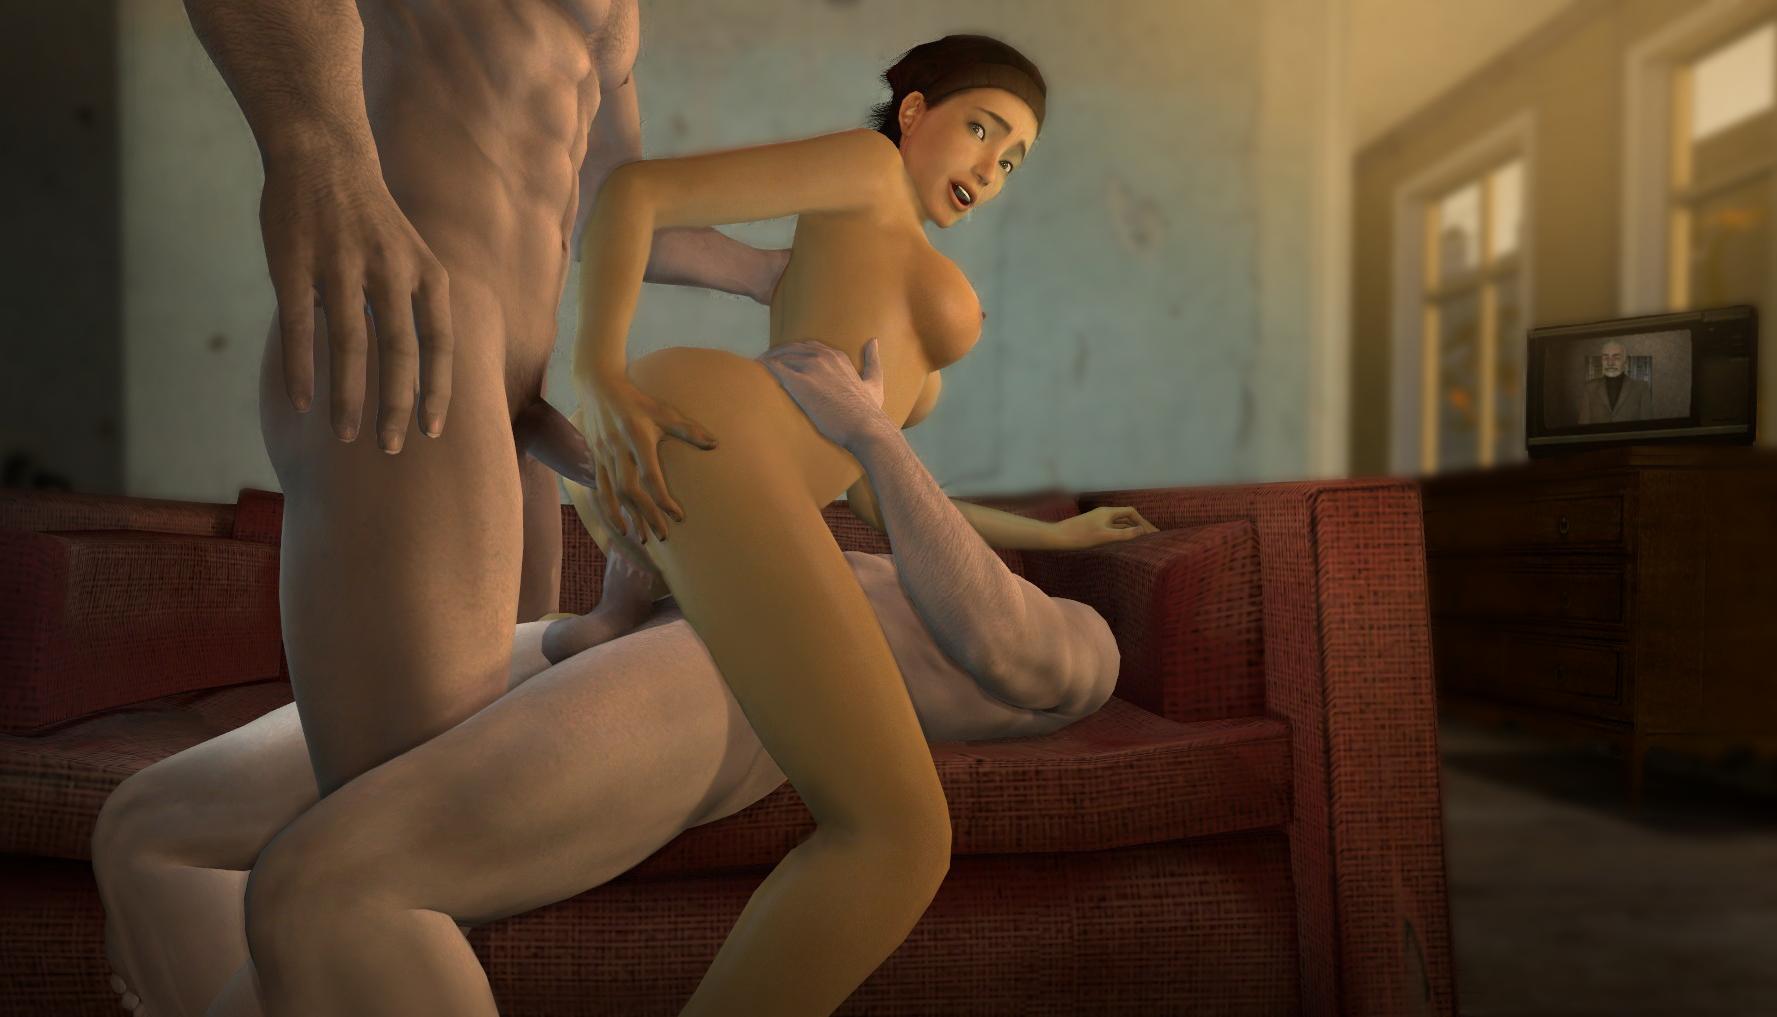 Alyx vance half life porn 3d hentai download